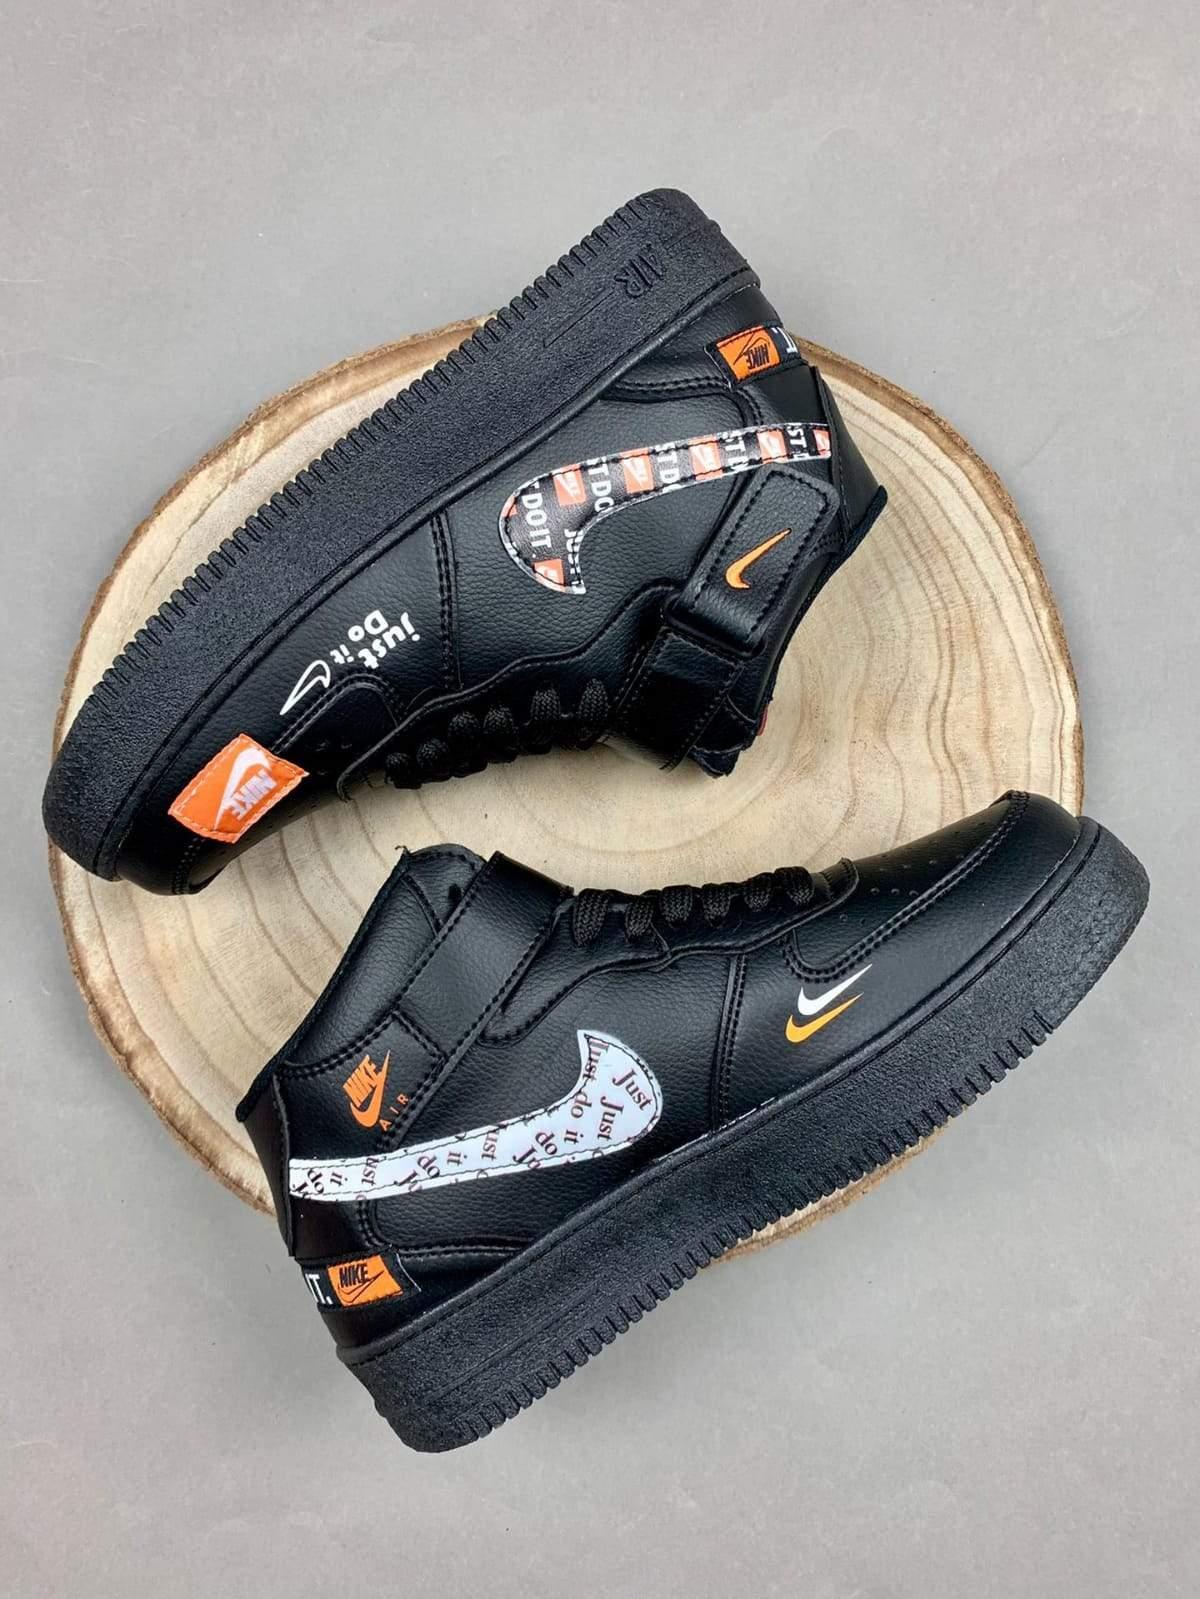 Nike air force just do it bota negras